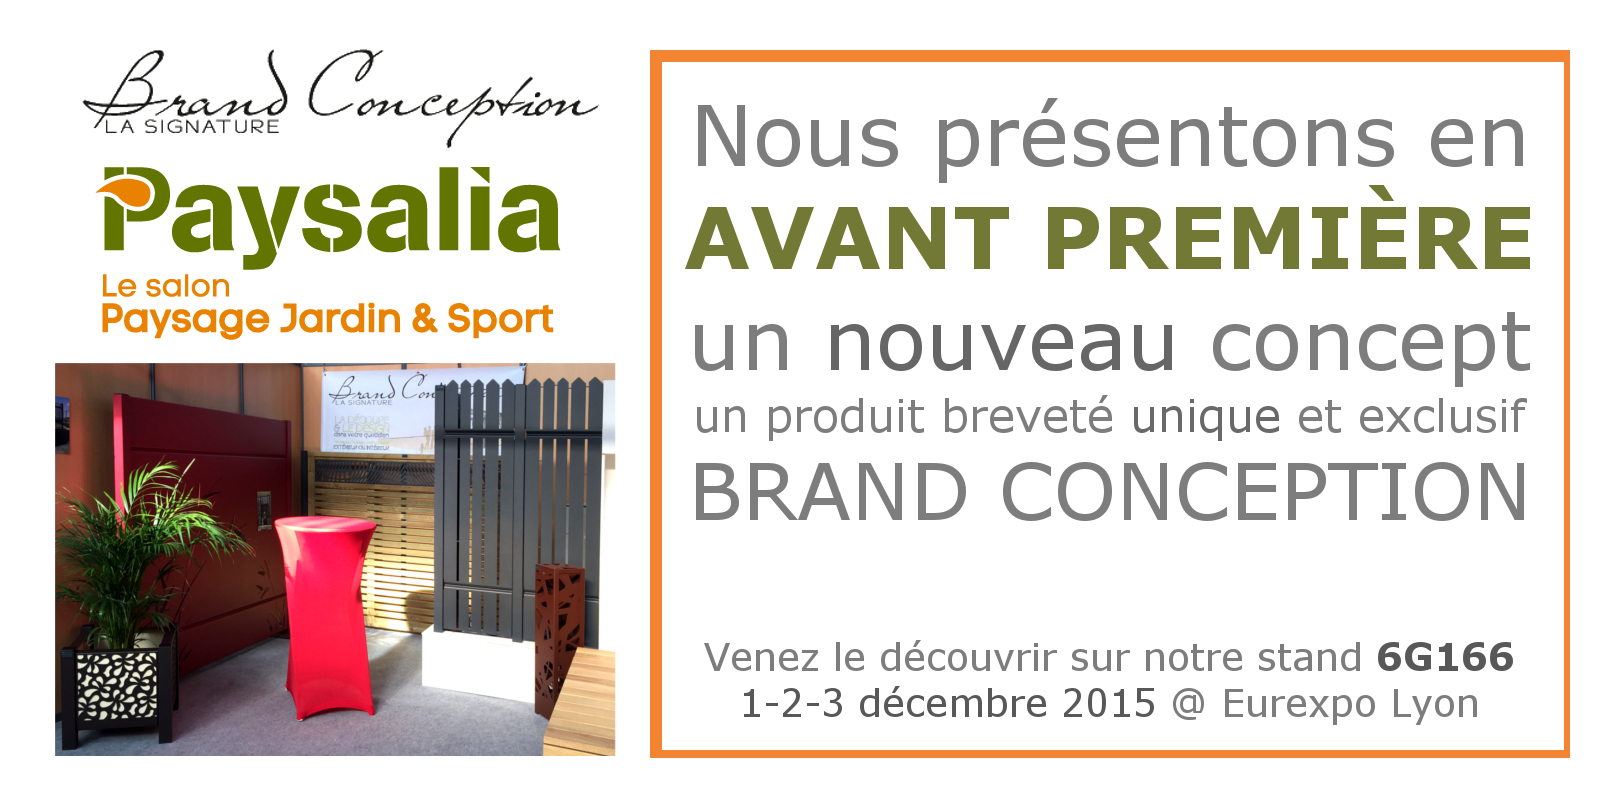 brand conception paysalia 1 2 3 d cembre 2015. Black Bedroom Furniture Sets. Home Design Ideas